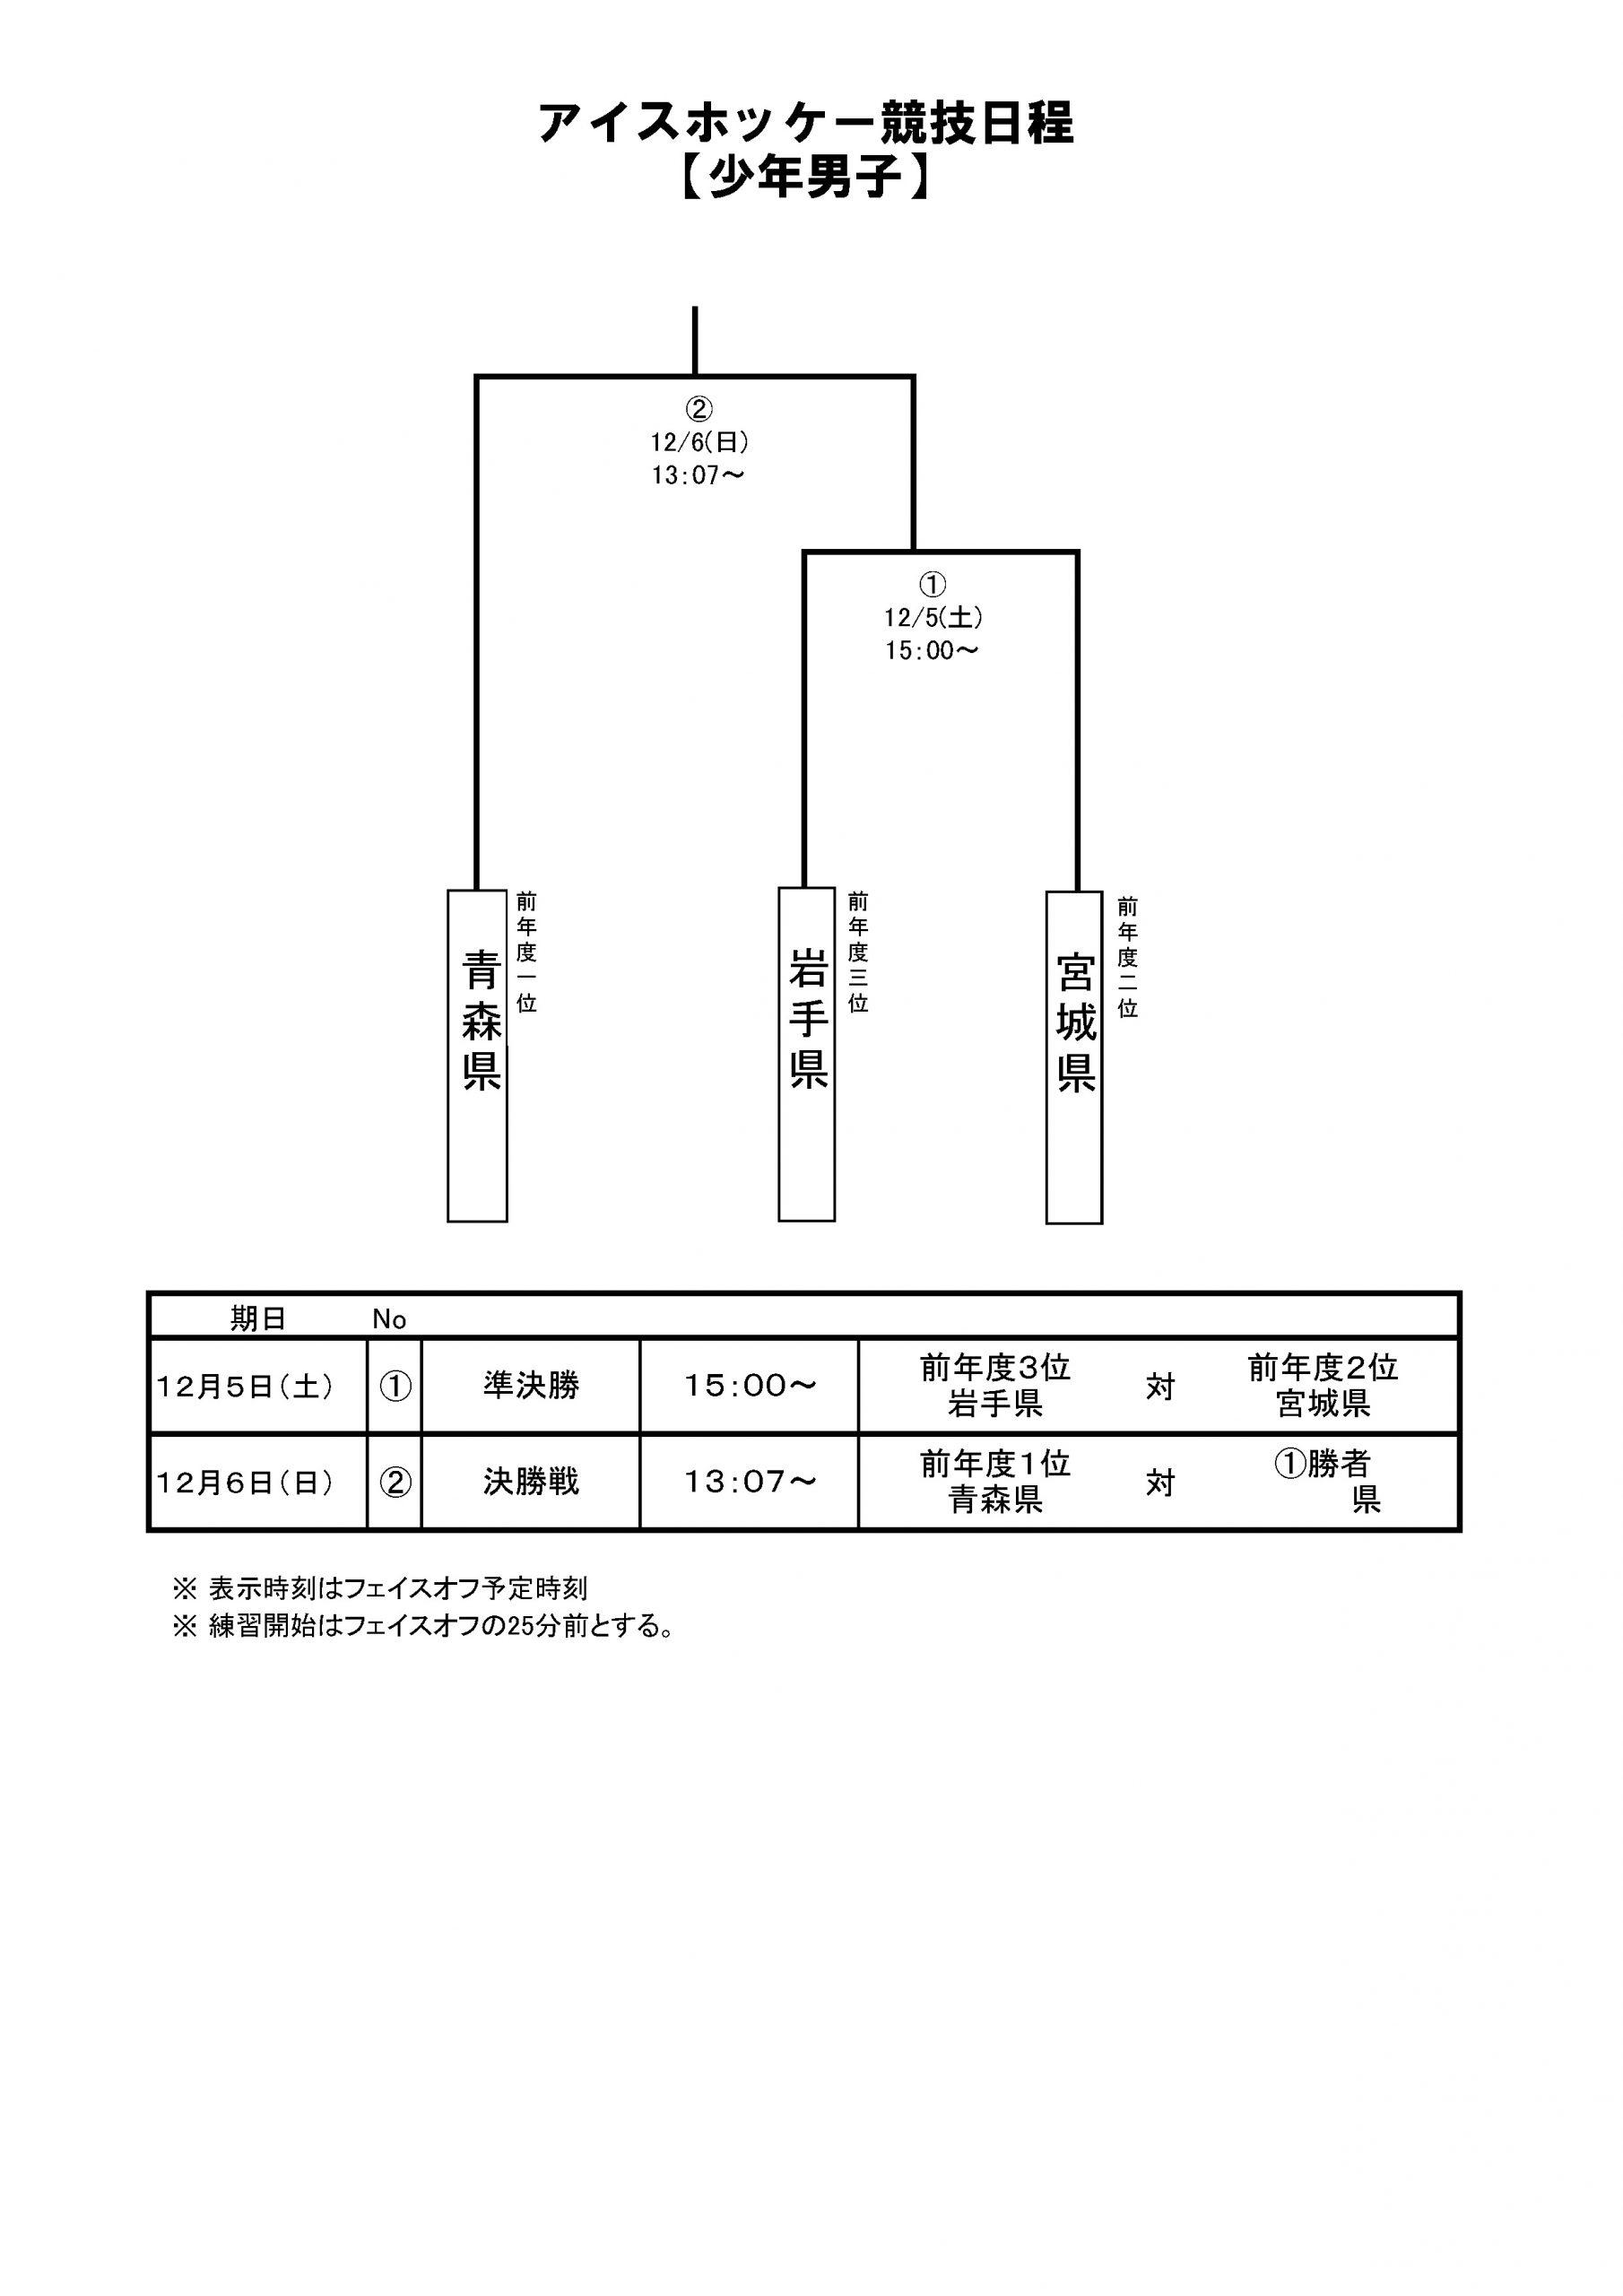 R02_競技日程表【少年男子】トーナメント1107